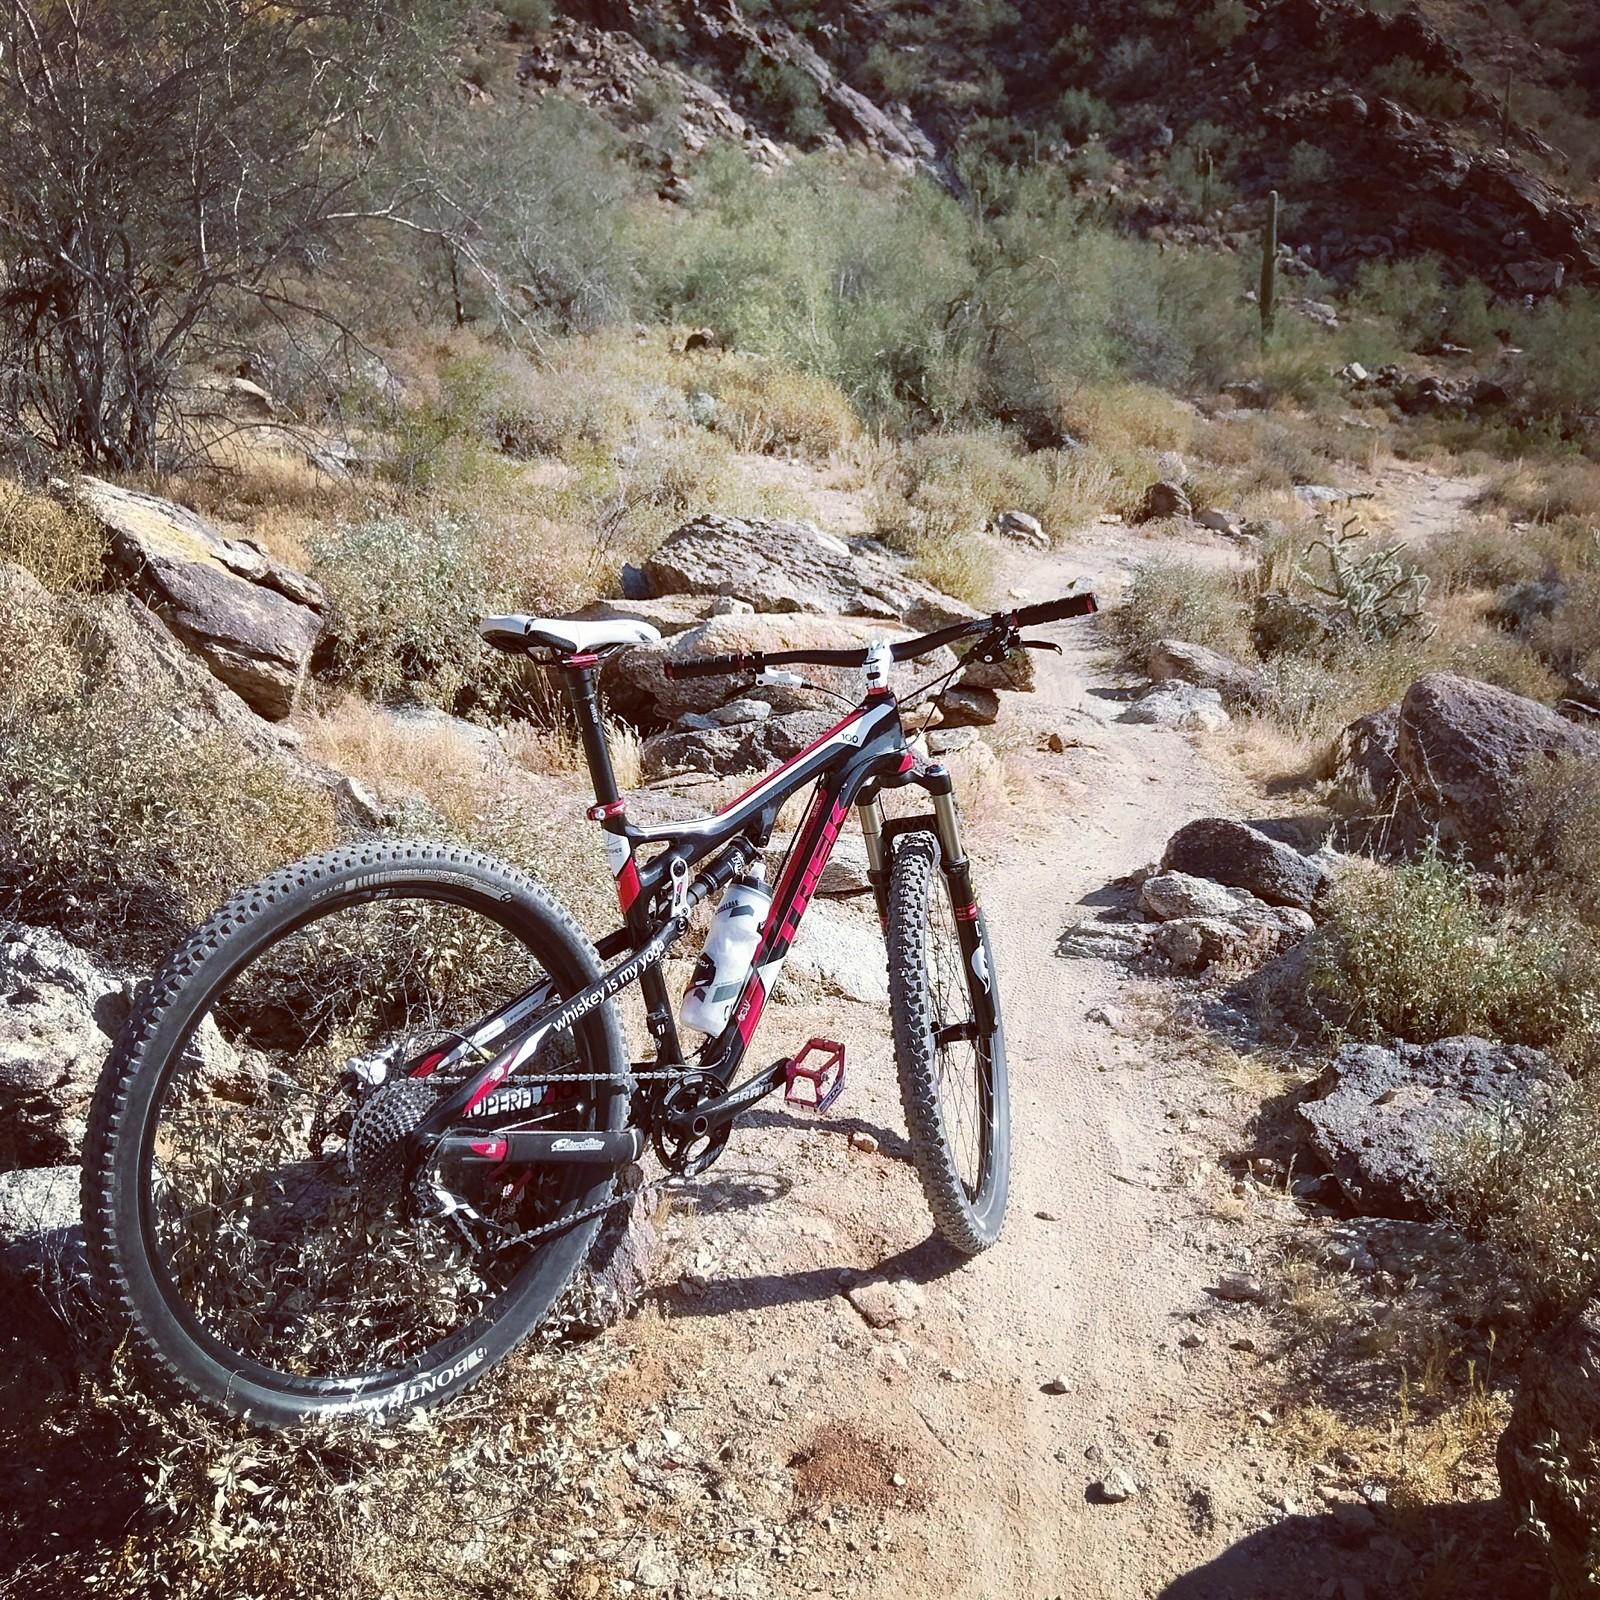 Out at White Tank Mountains in AZ.